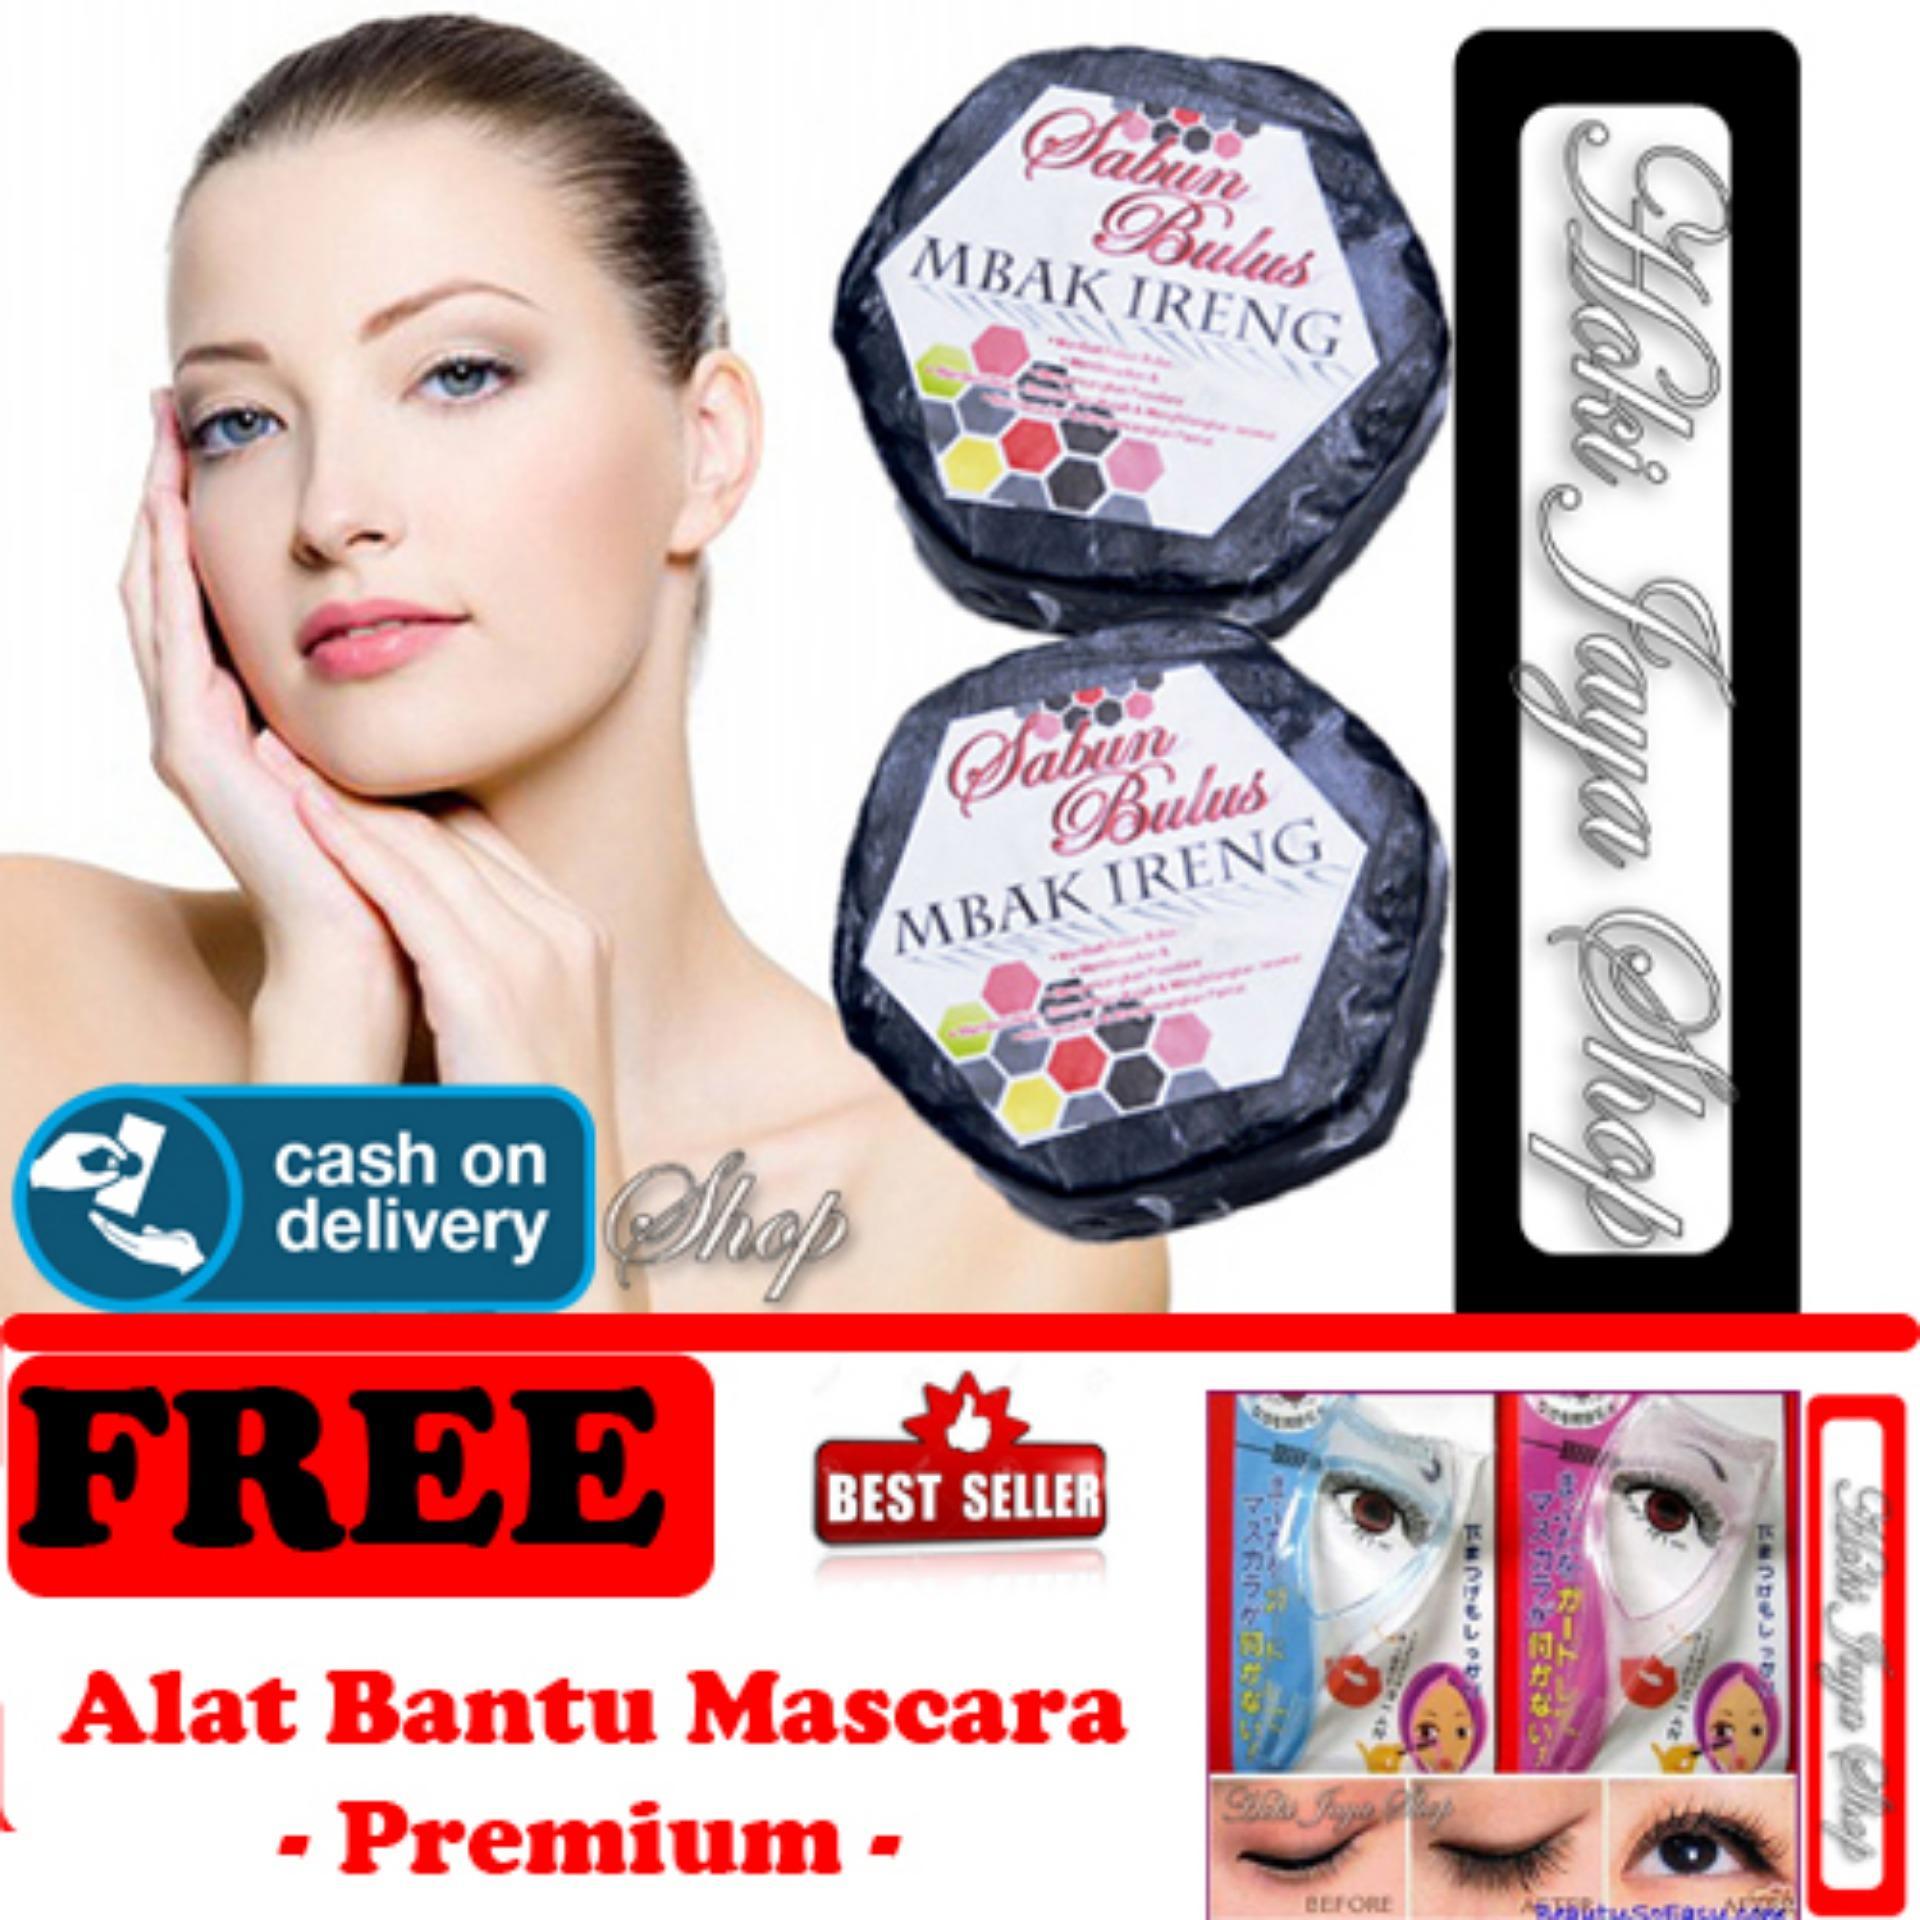 HOKI COD - Sabun Bulus Original Mbak Ireng - Hitam FREE Mascara Helper - Alat Bantu Maskara - 1 Pcs